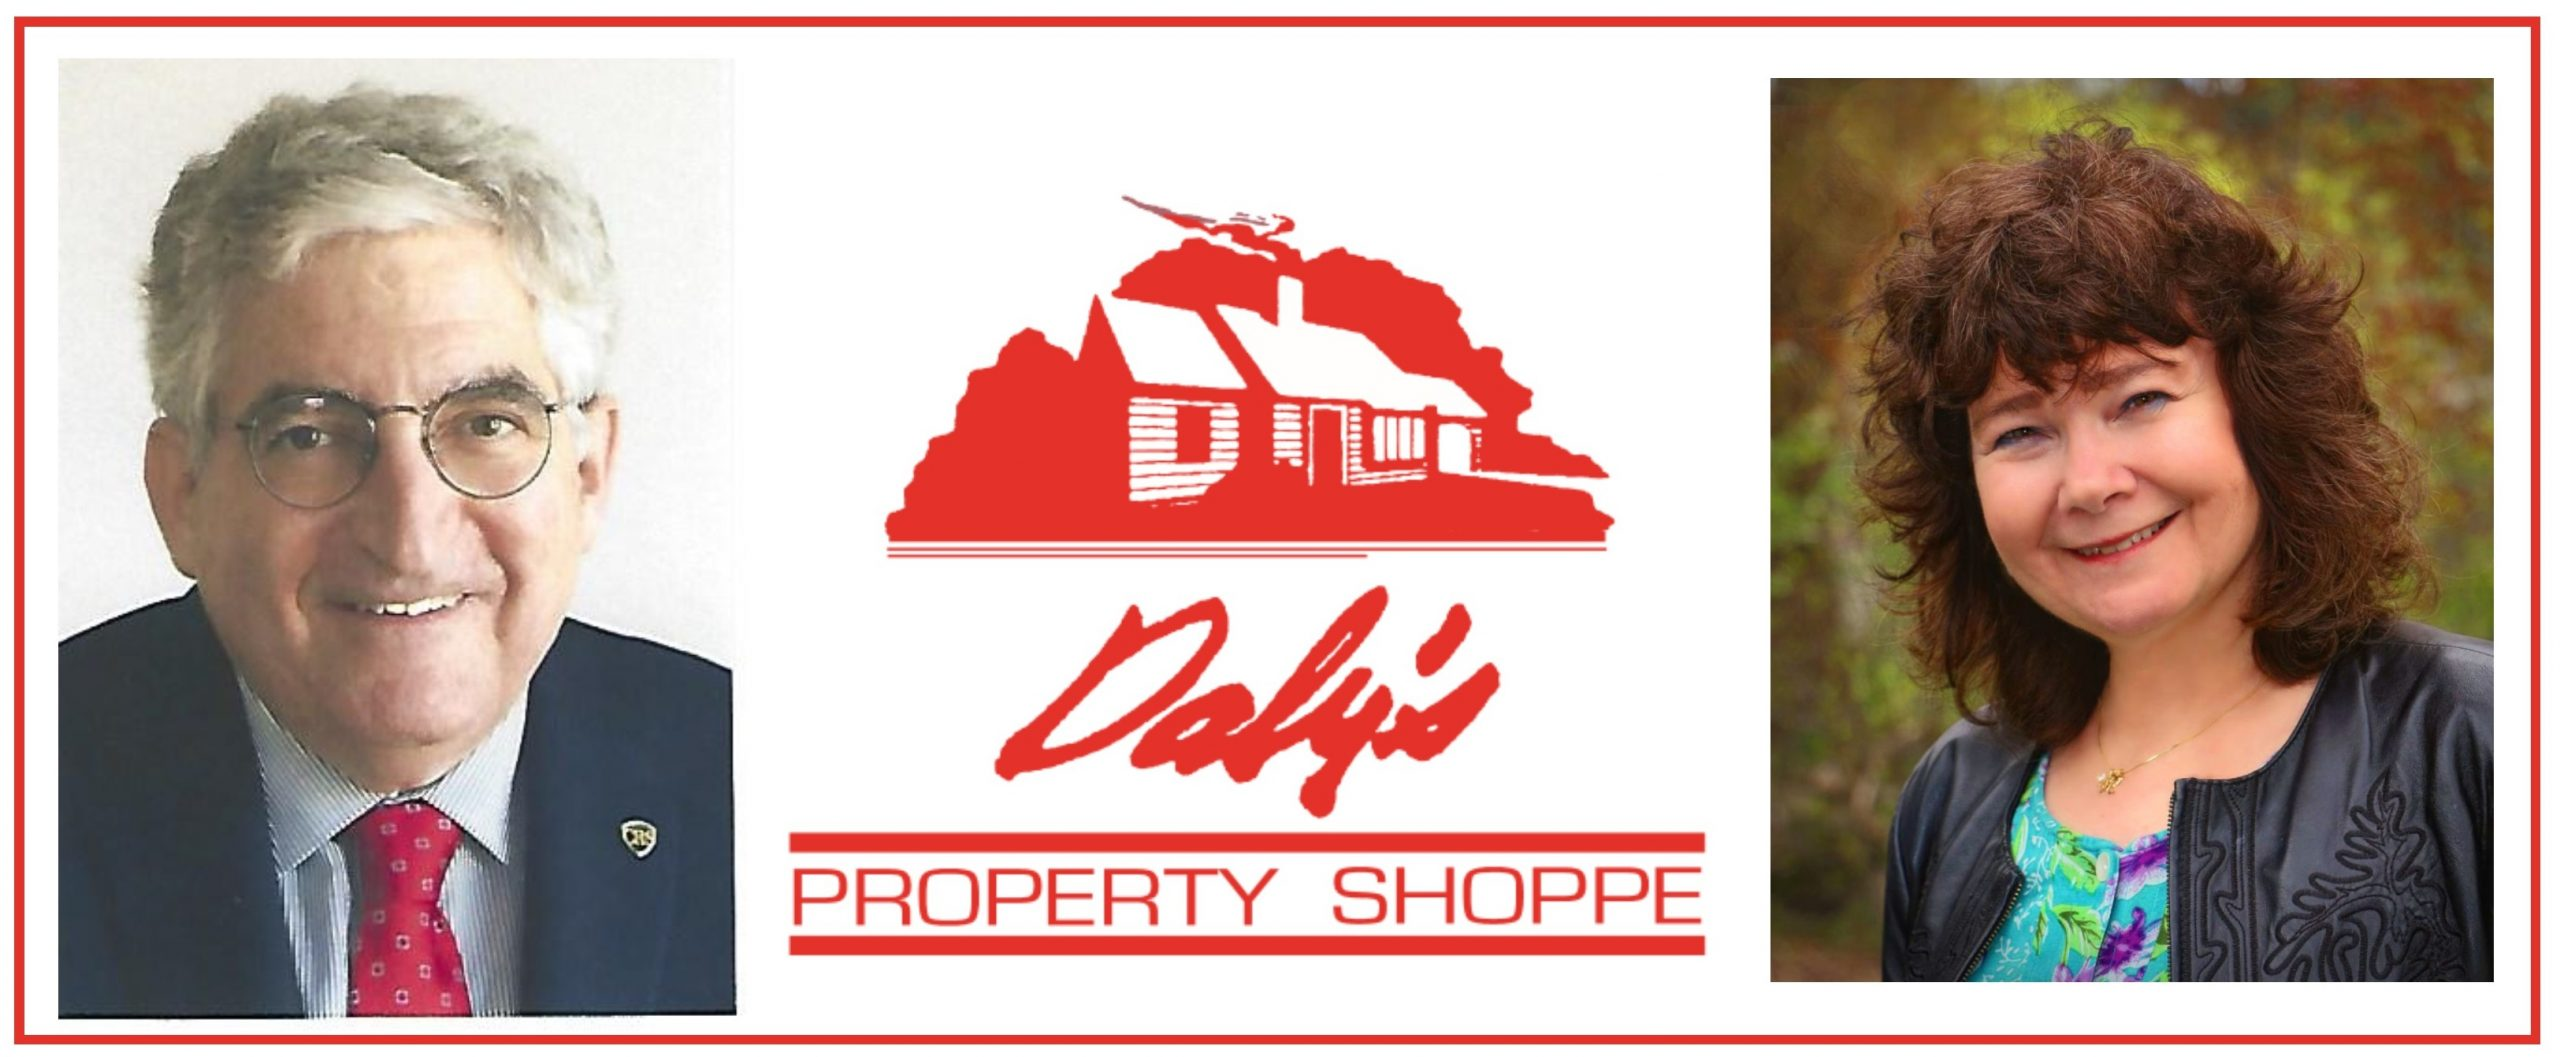 Daly's Property Shoppe Gardner MA